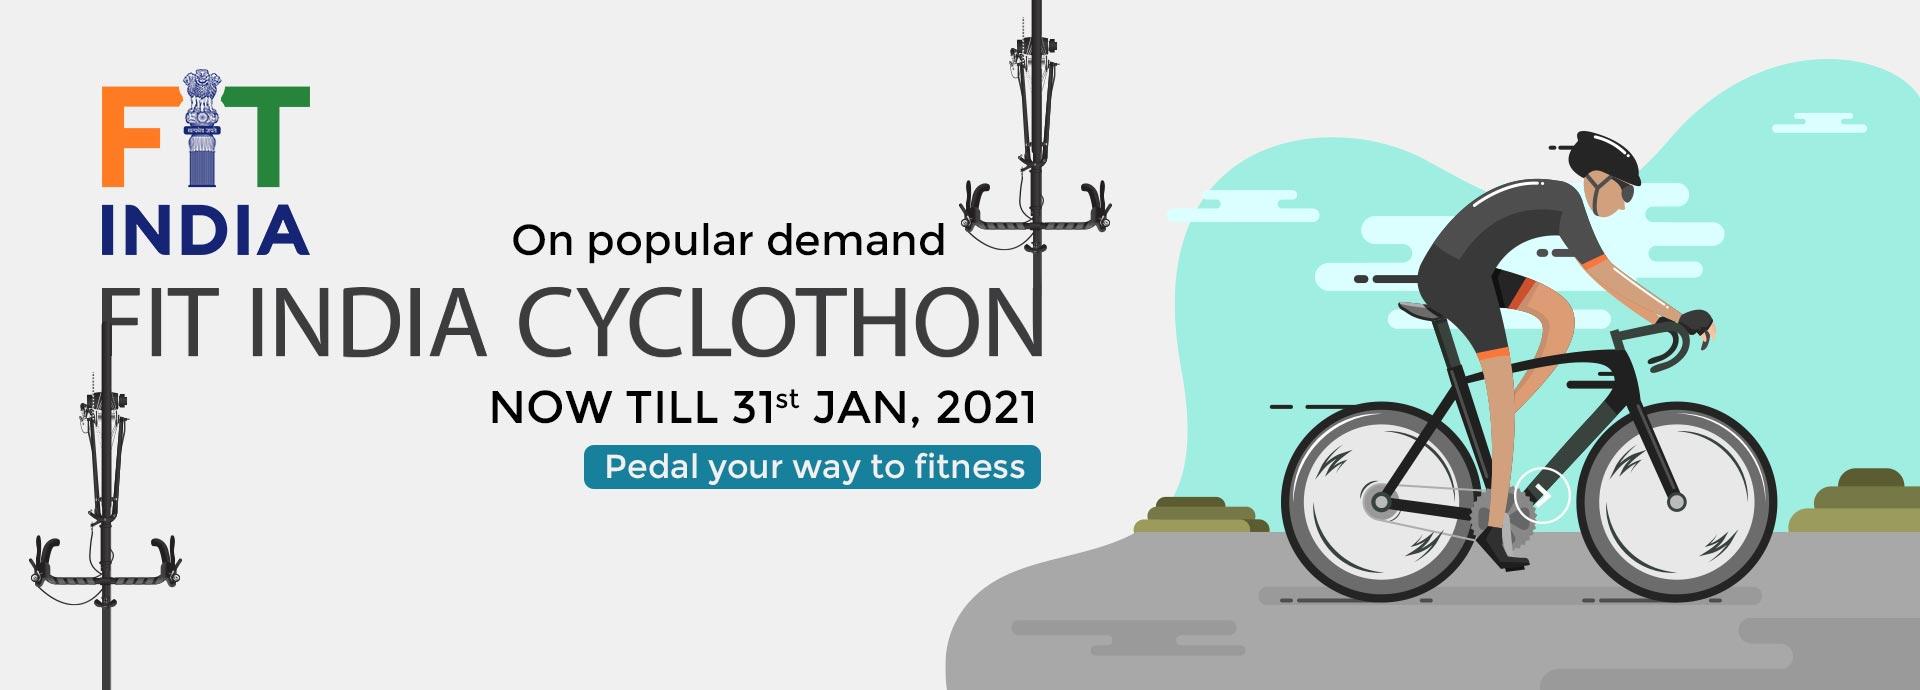 cyclothon 2020